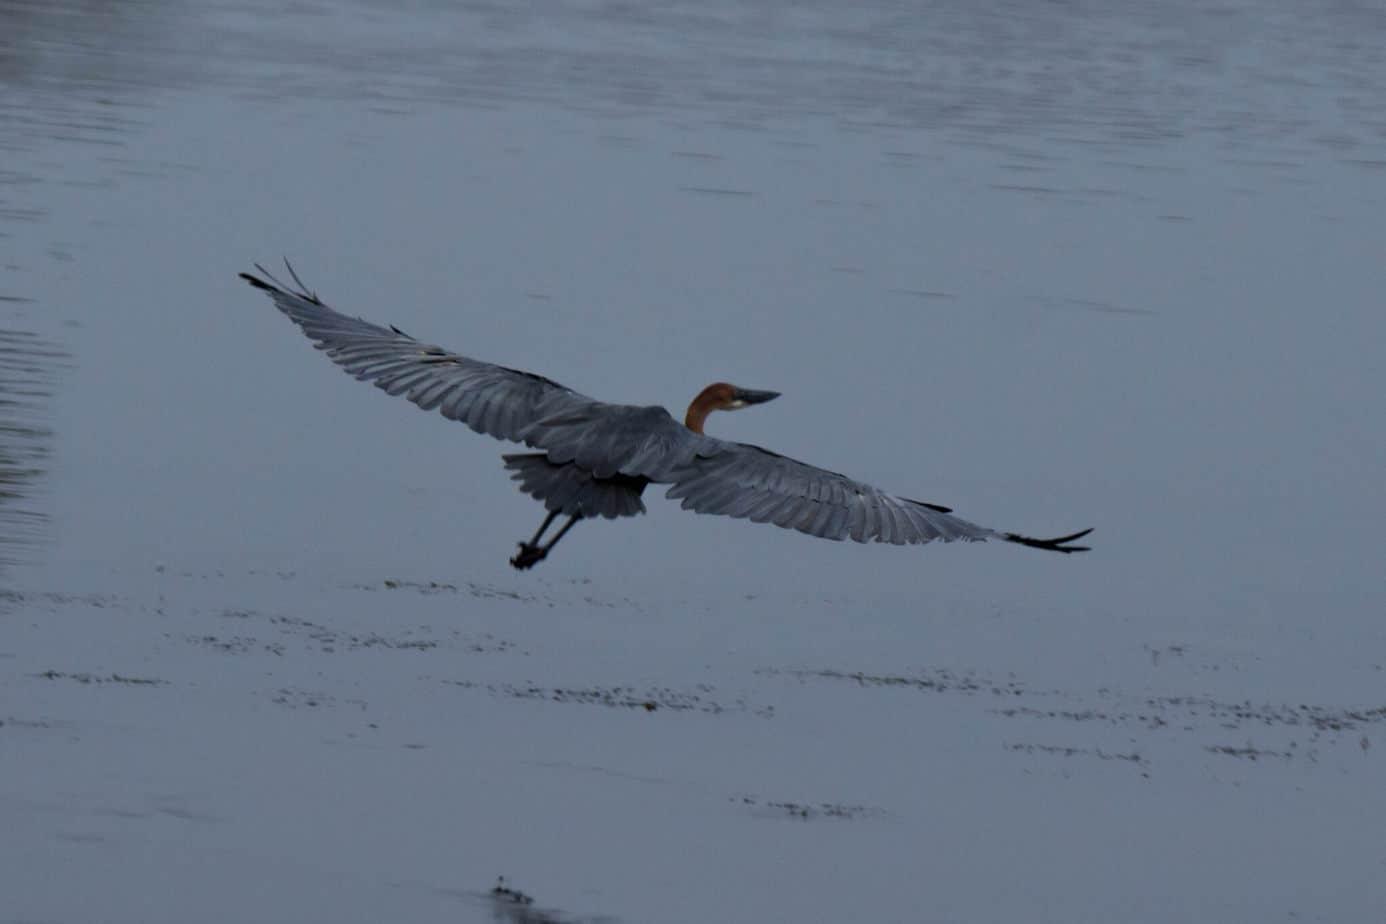 Goliath Heron @ Ndumo Game Reserve. Photo: Håvard Rosenlund